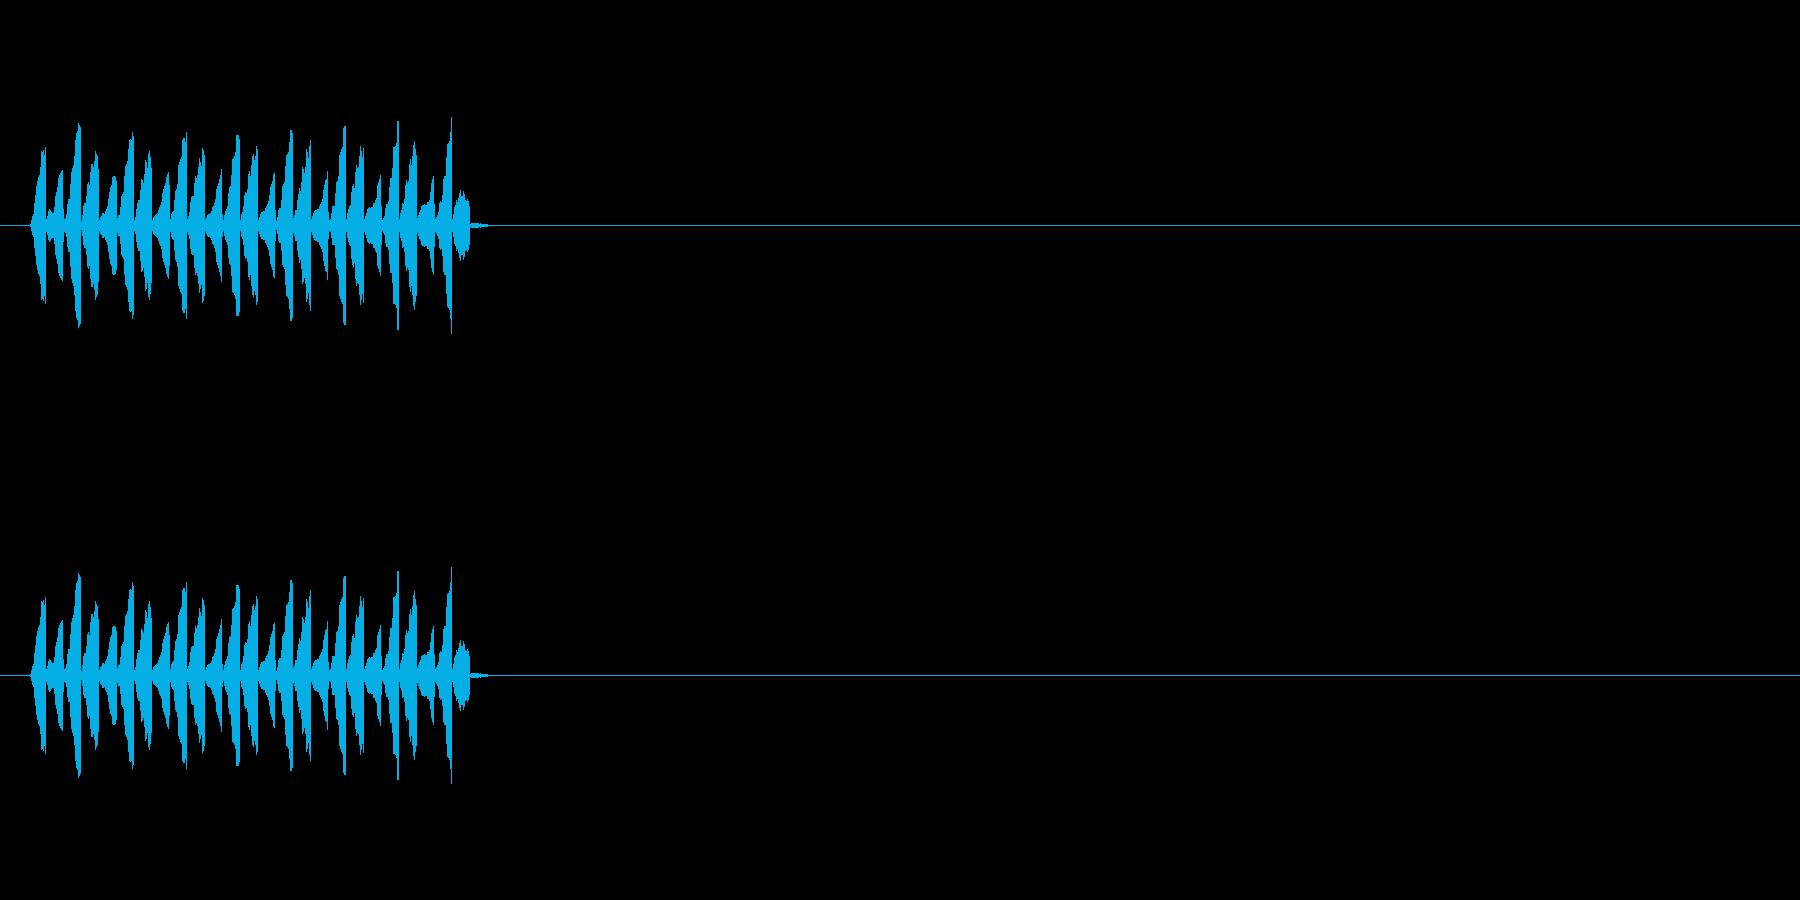 NPC会話音(声が高い)の再生済みの波形